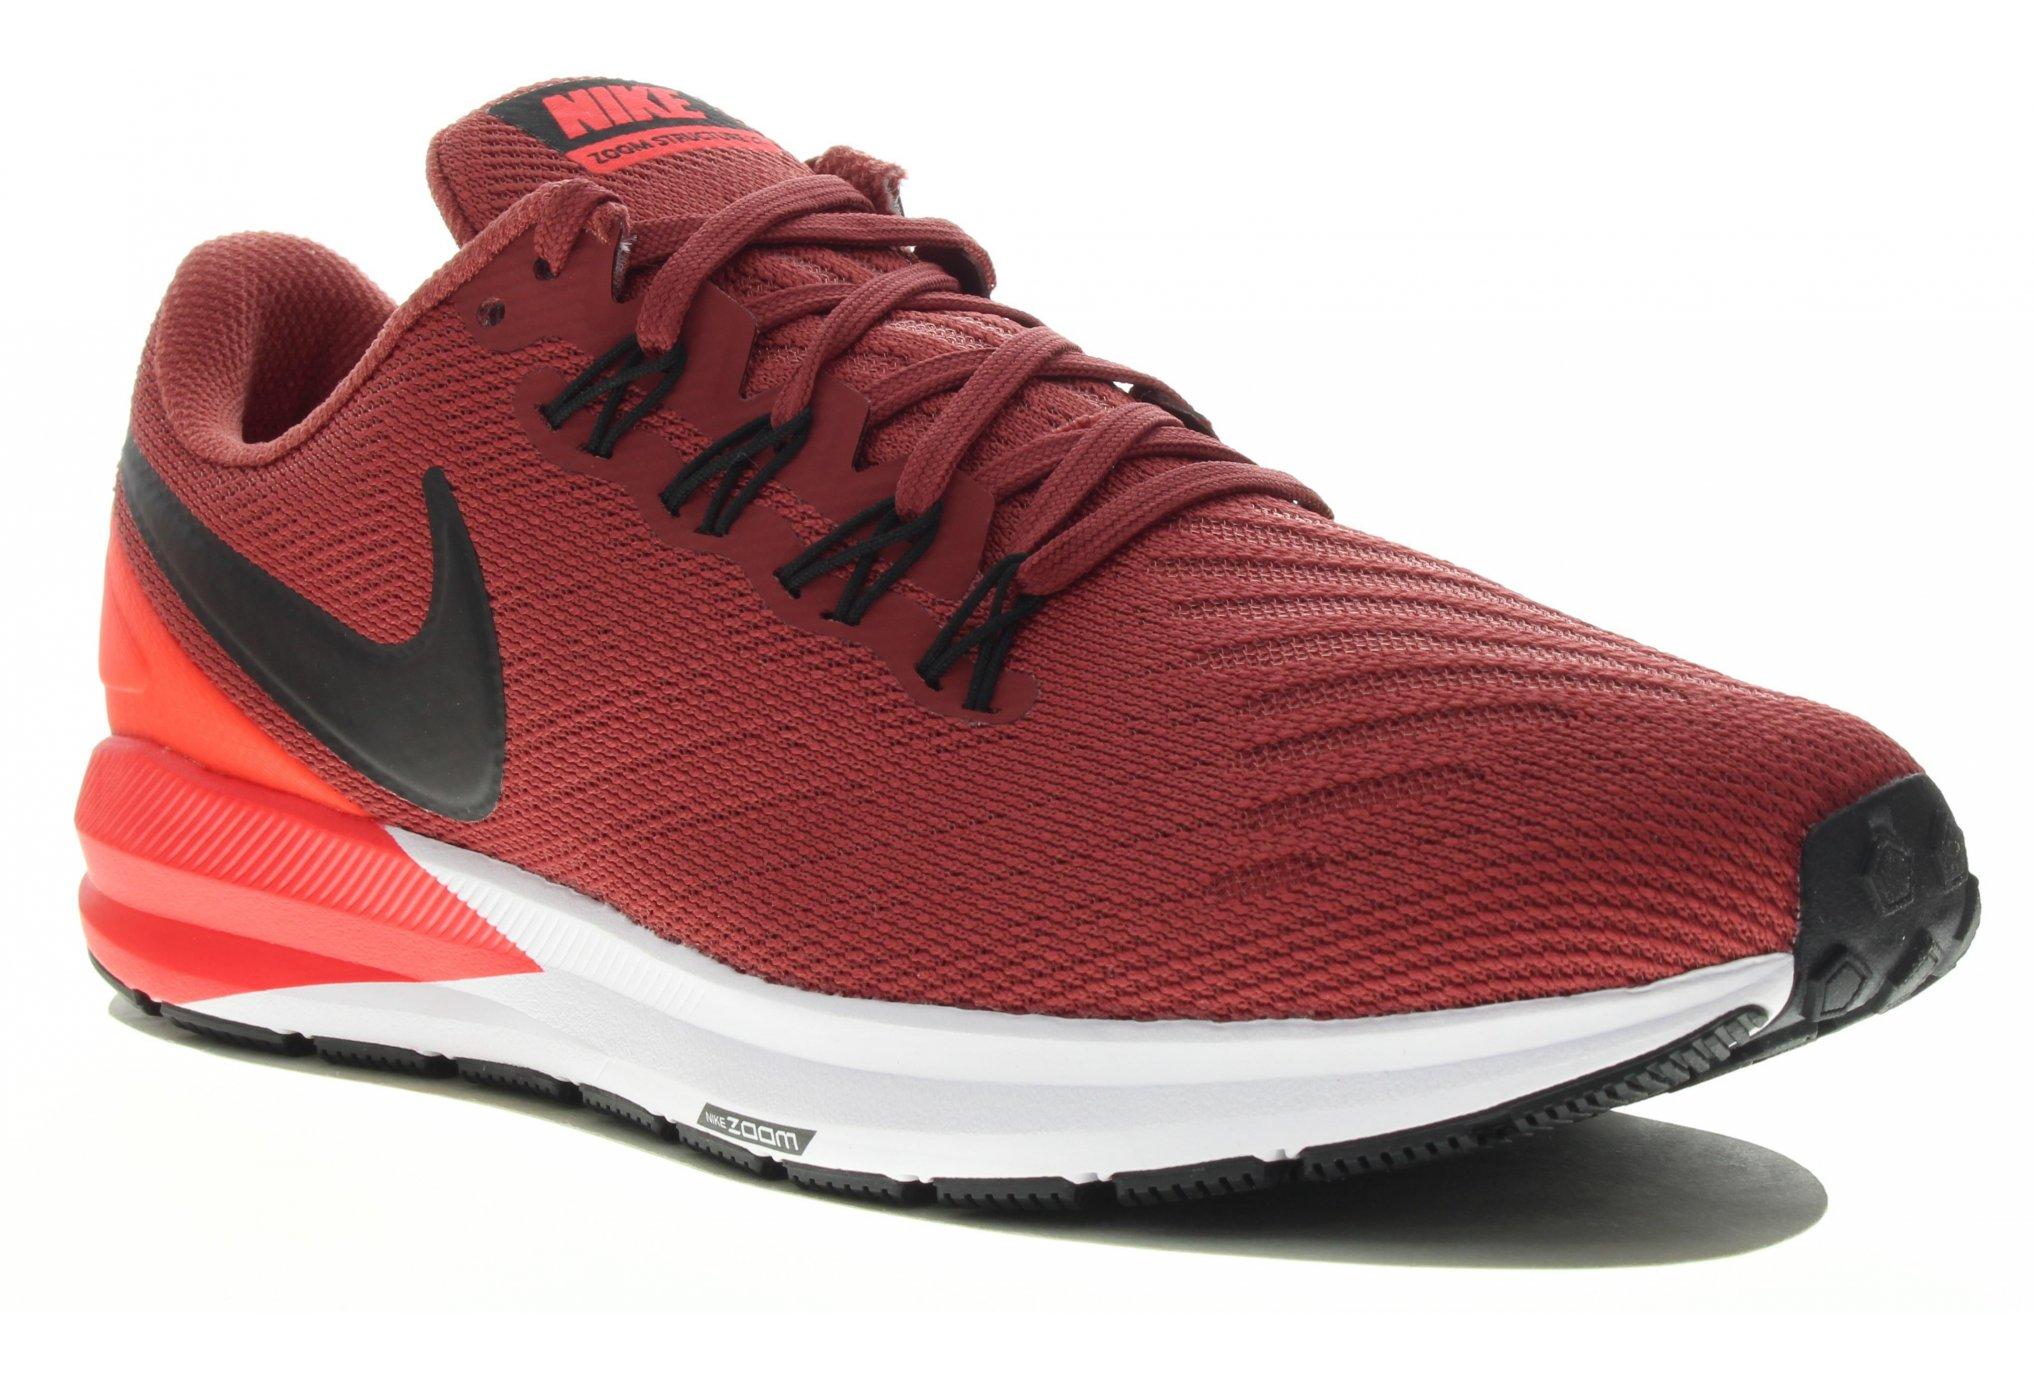 acheter en ligne 39794 0ee4e Nike Zoom Structure +17 M